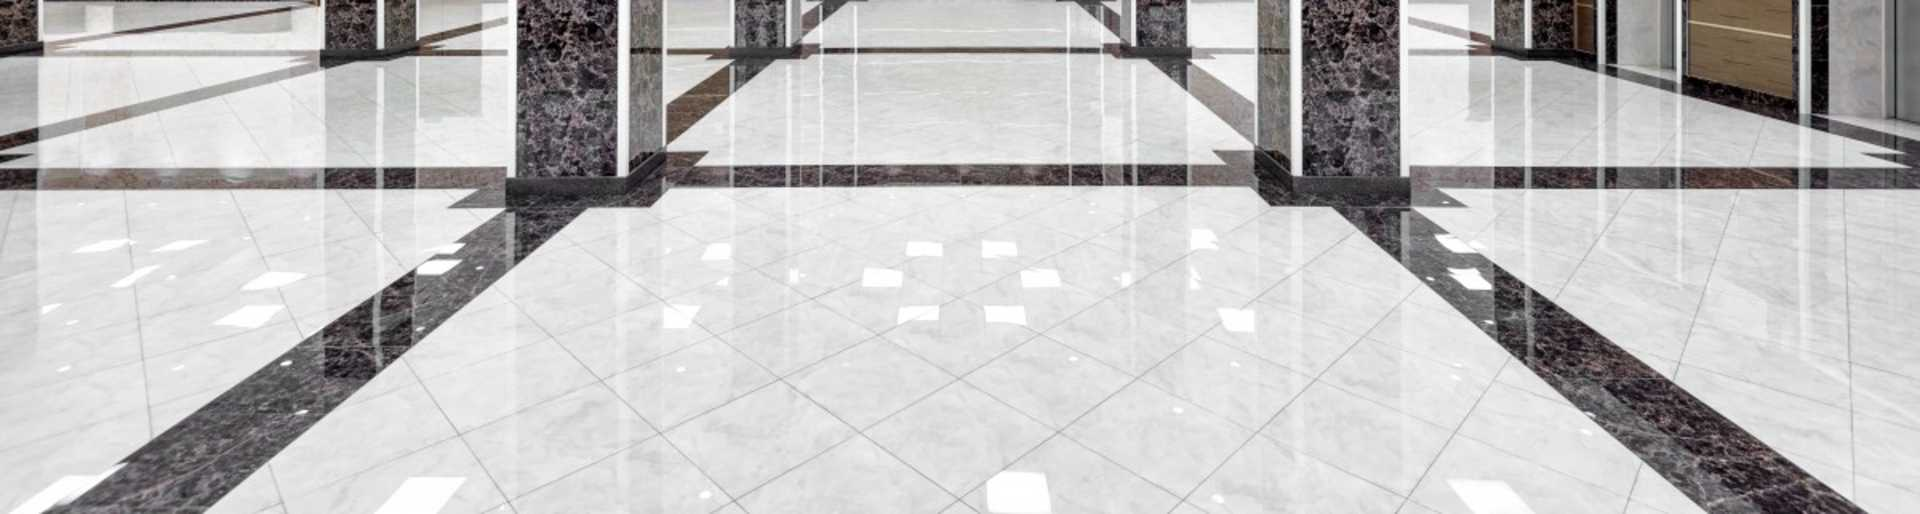 Finished Epoxy Flooring | Concrete Flooring Restoration